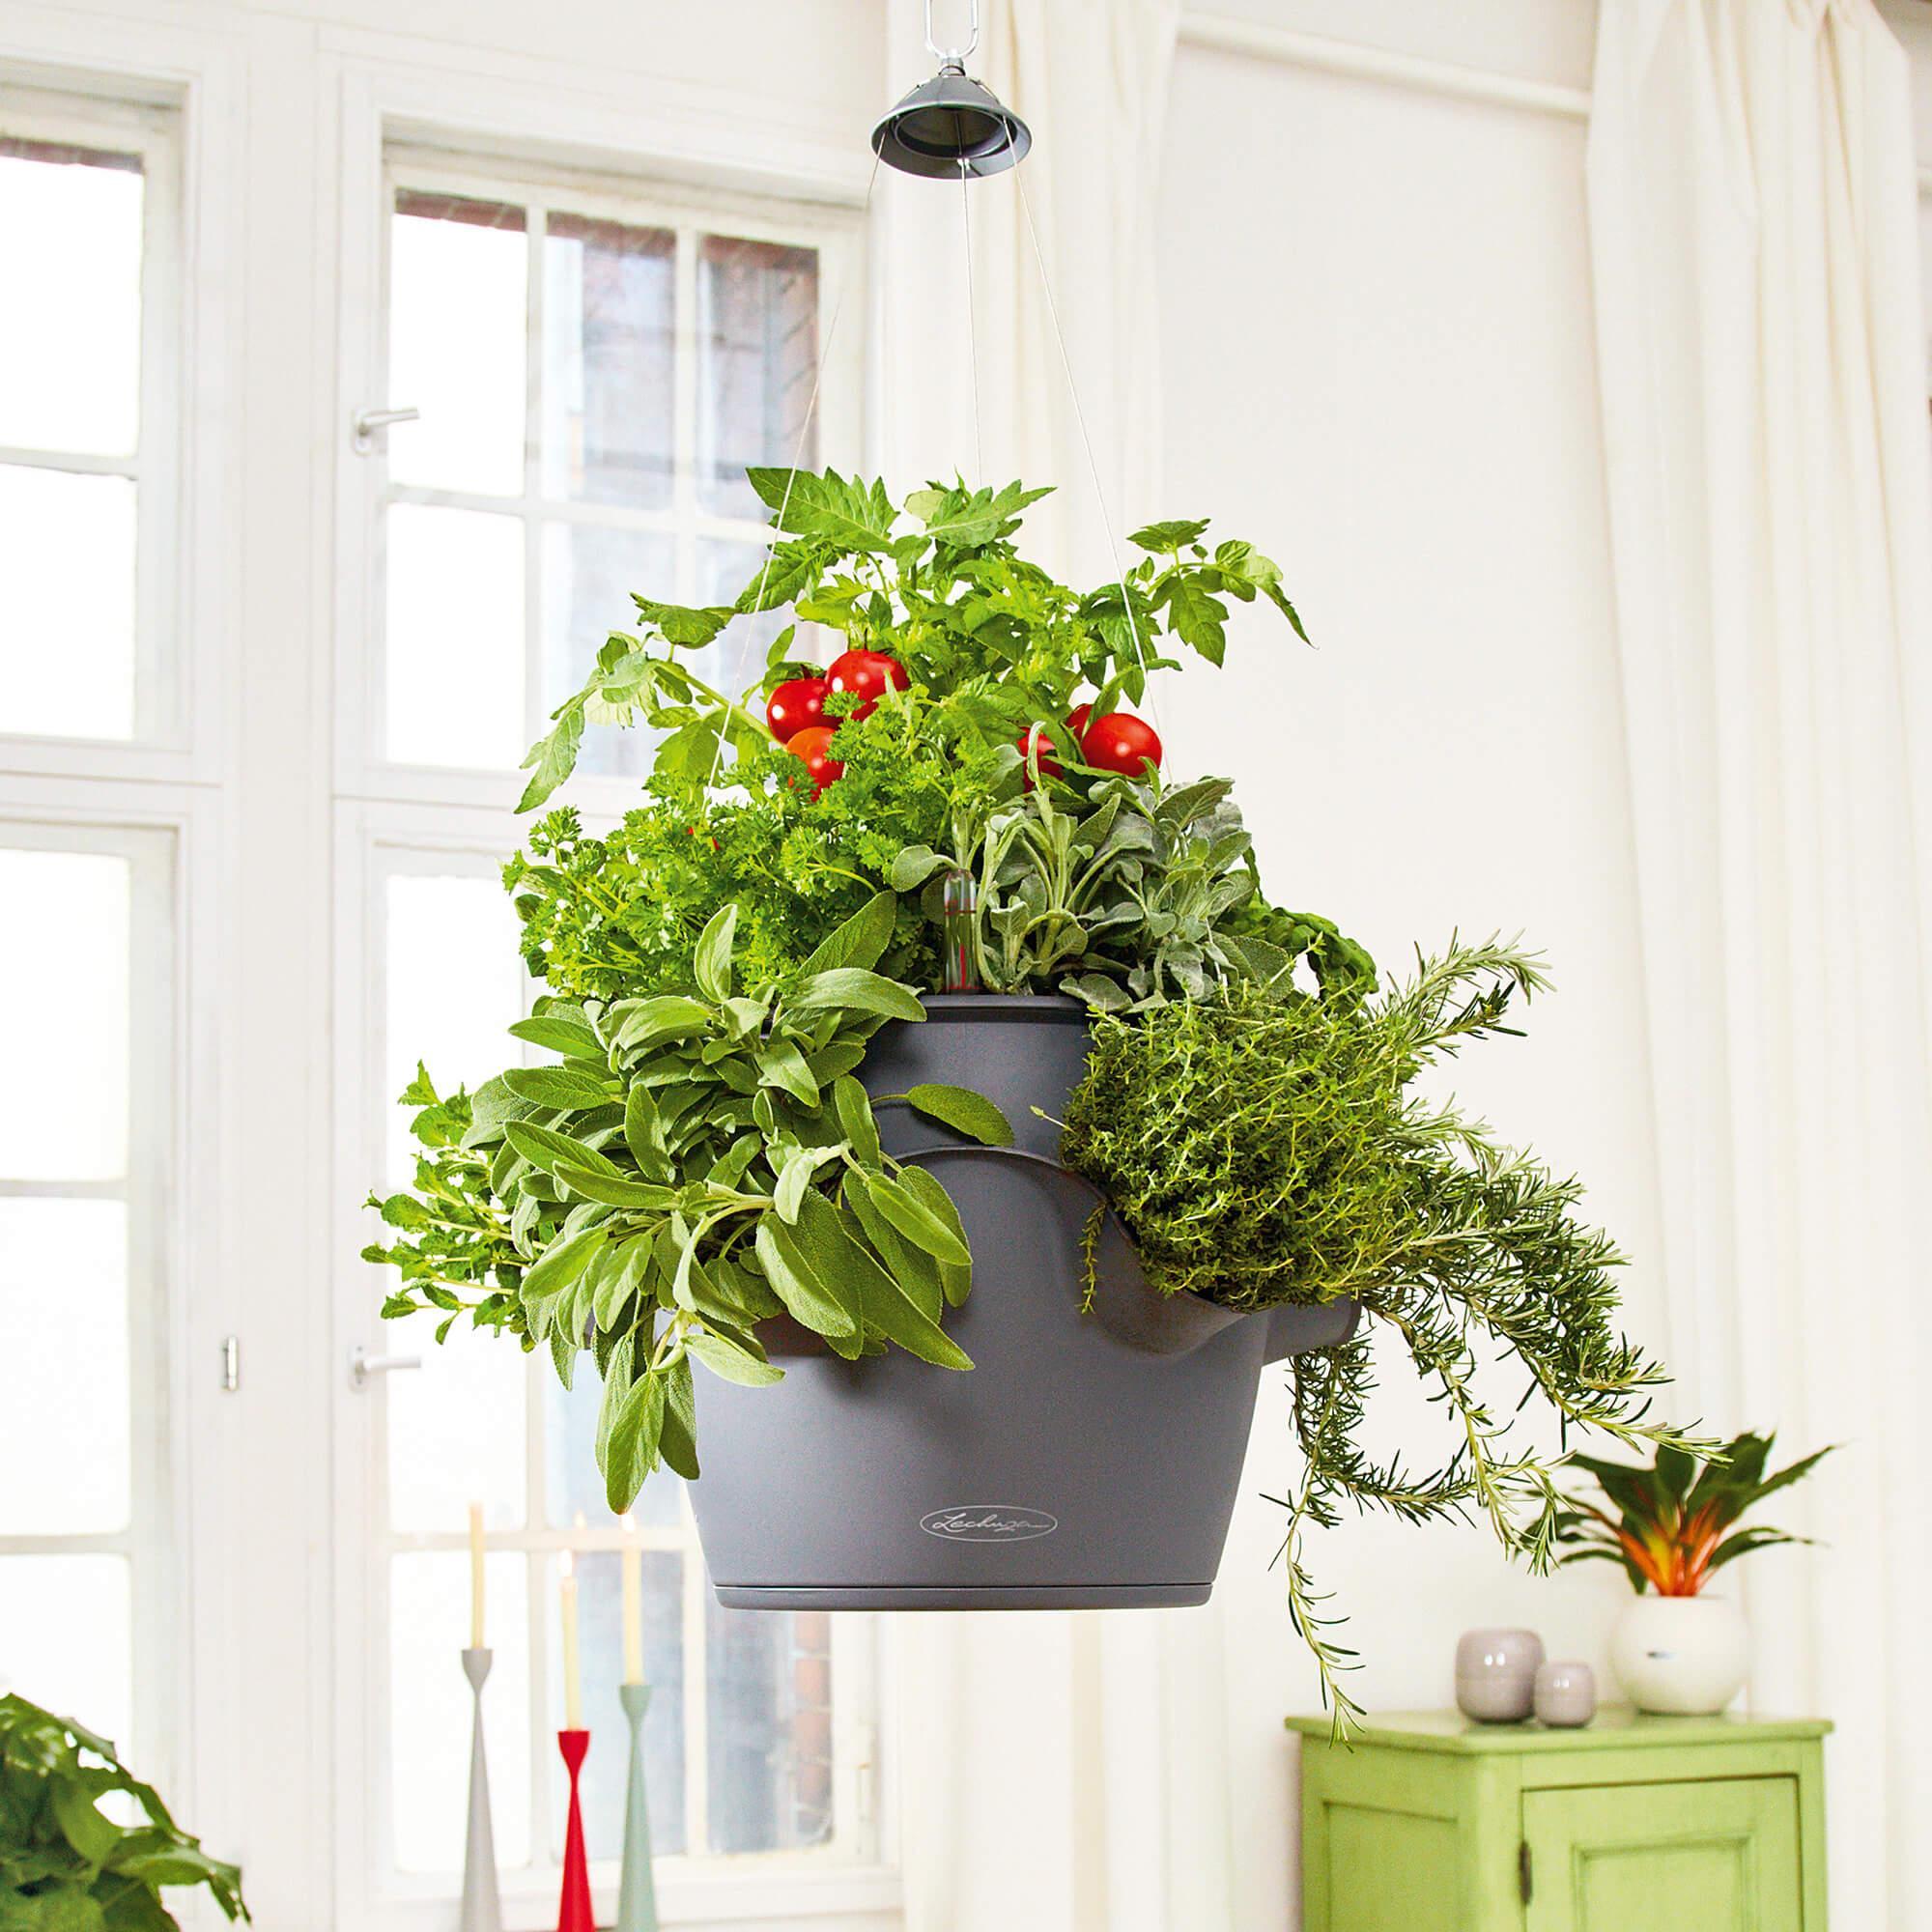 CASCADINO Color Single hanging planter slate - Image 3